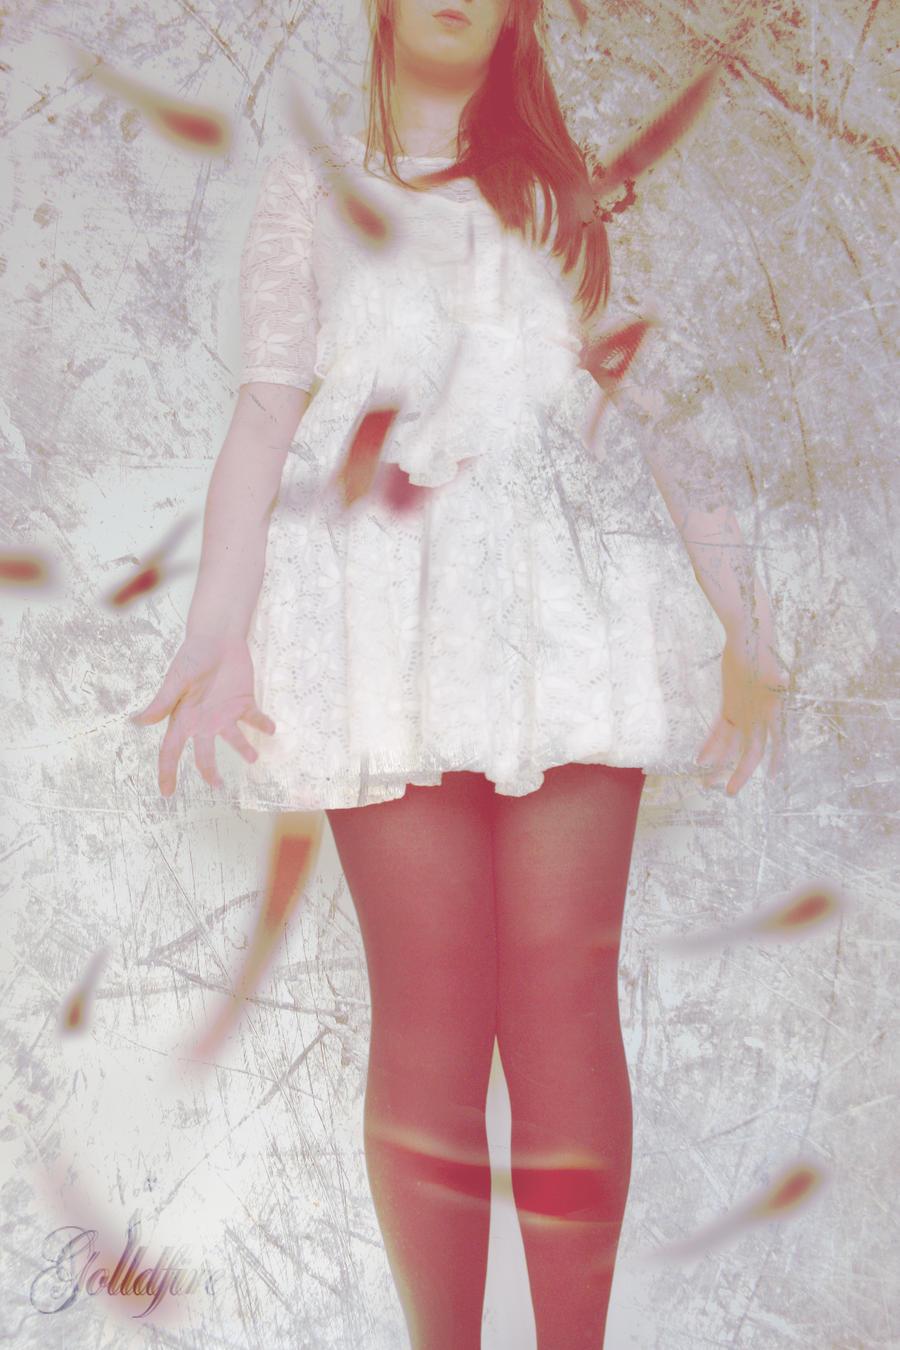 12-03-2012 - Memories falling down around me. by Golldfire